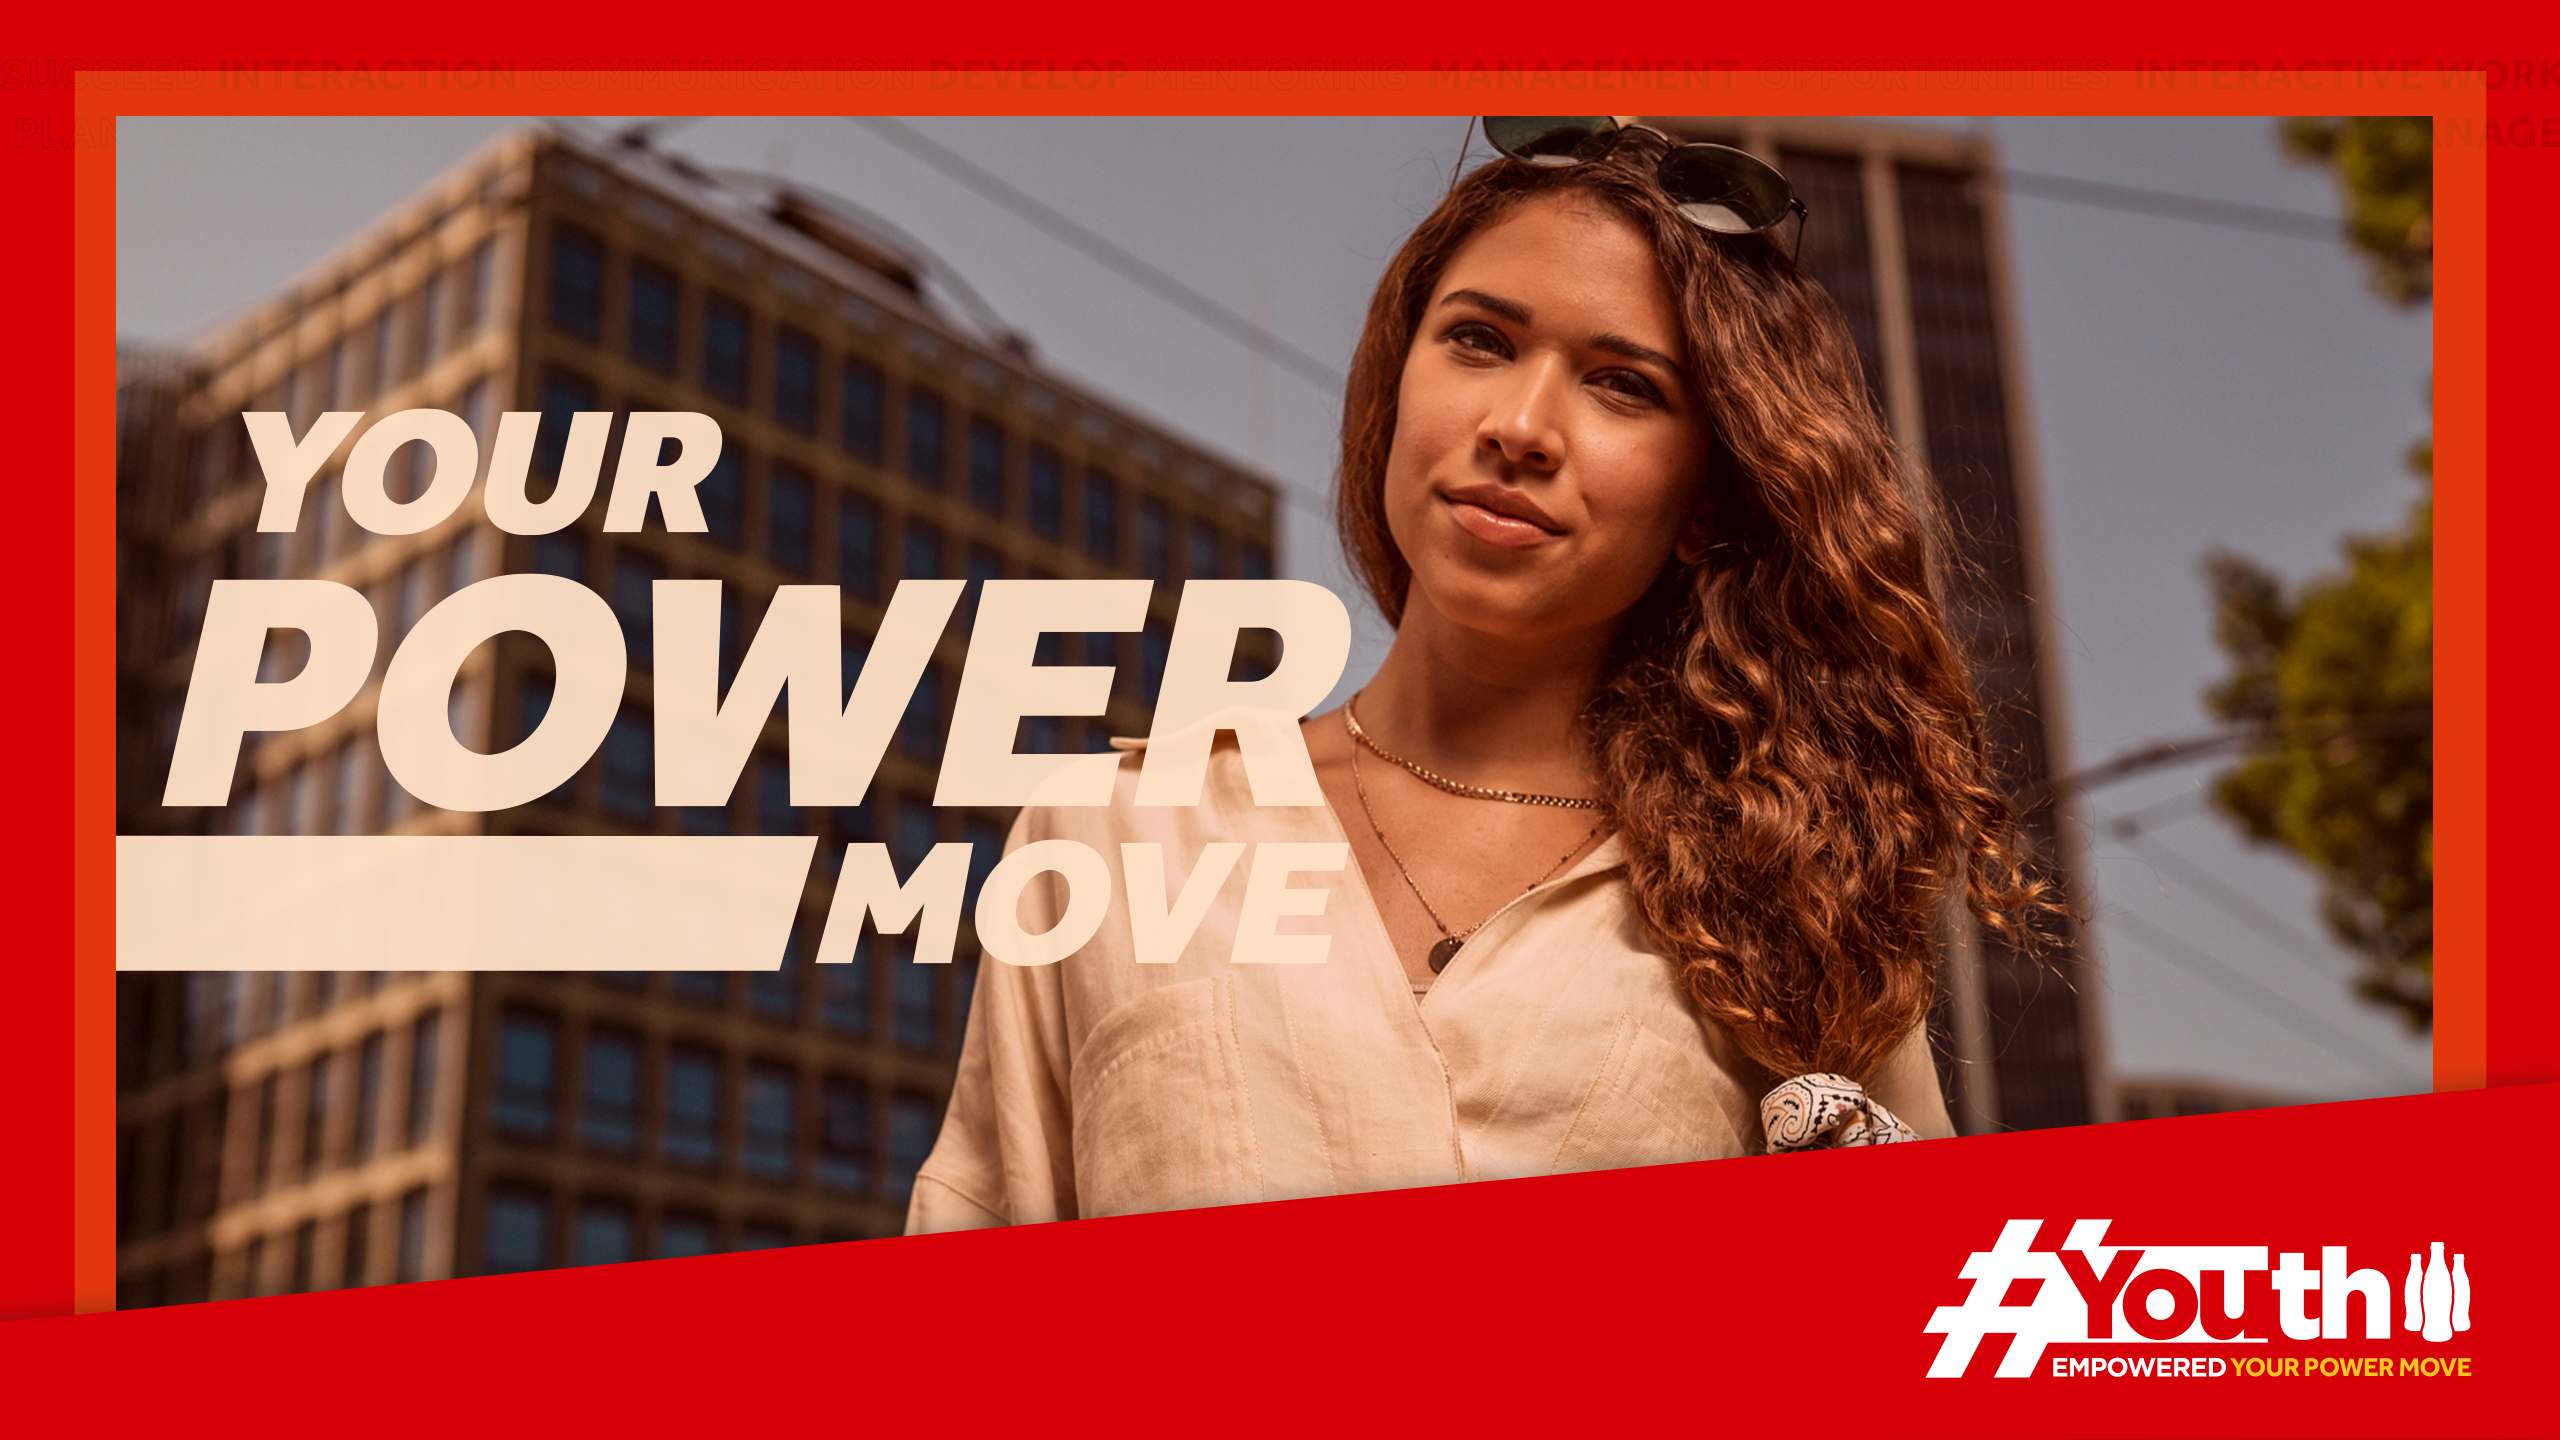 Youth Empowered: Νέα προγράμματα απασχόλησης για νέους – Θέσεις εργασίας από την Coca Cola